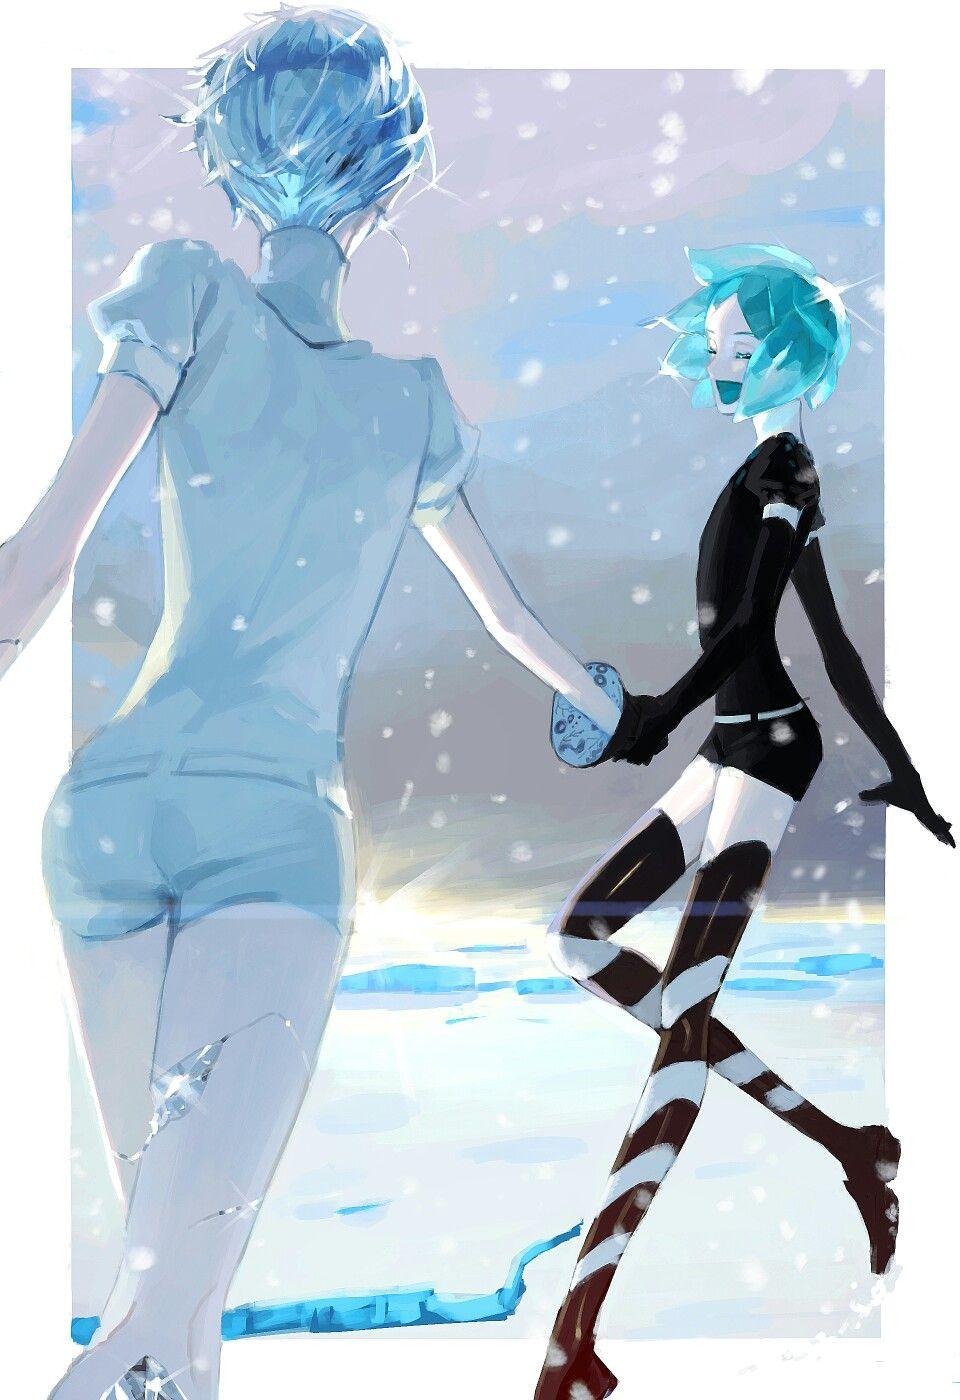 Anime Live Wallpaper Mp4